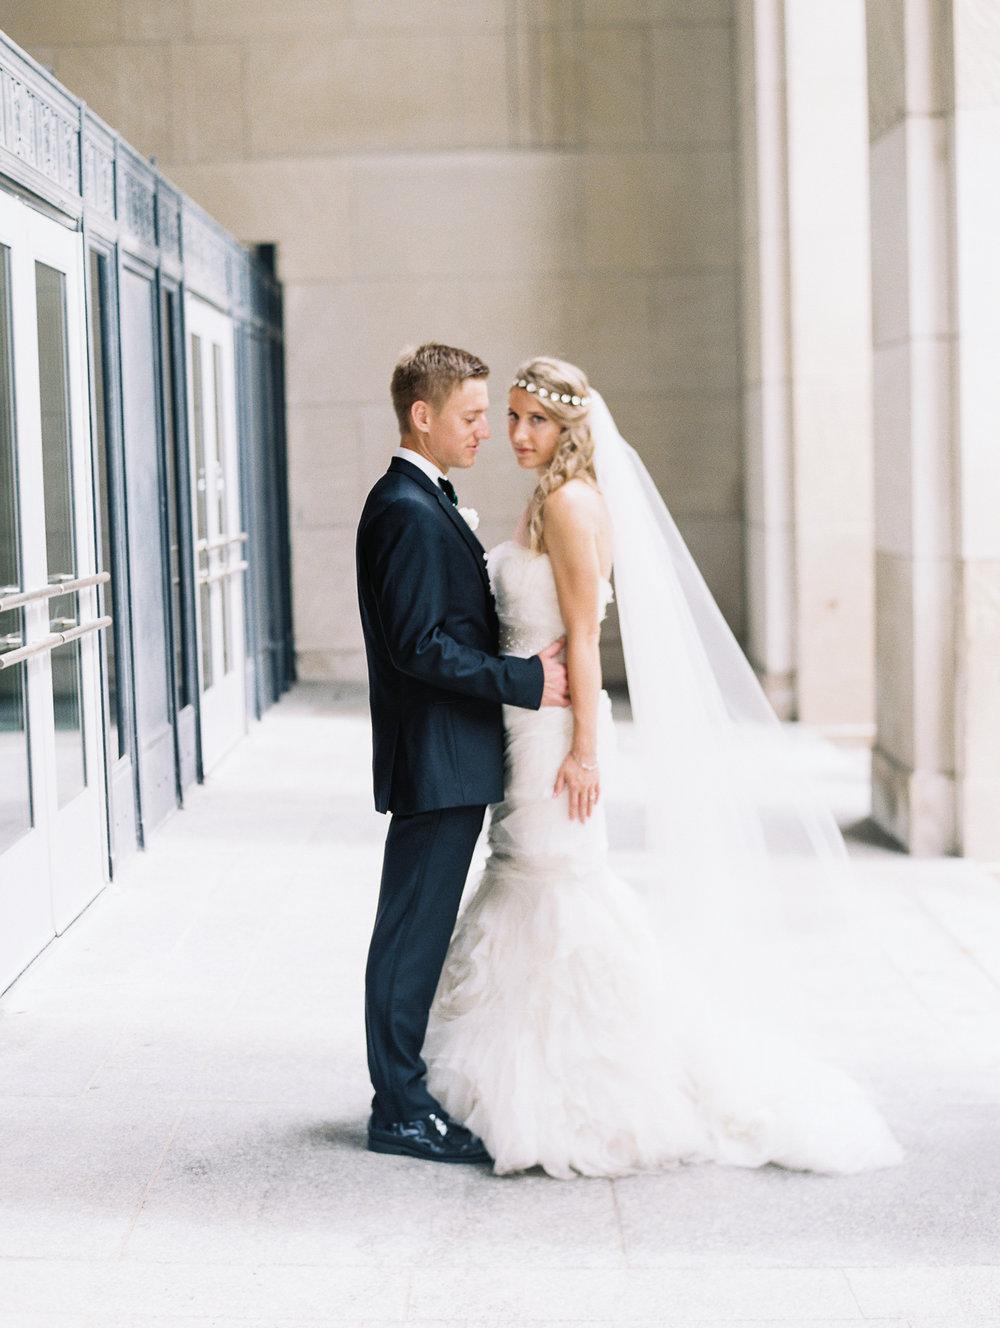 Zawisza Wedding f ASP©-14.jpg